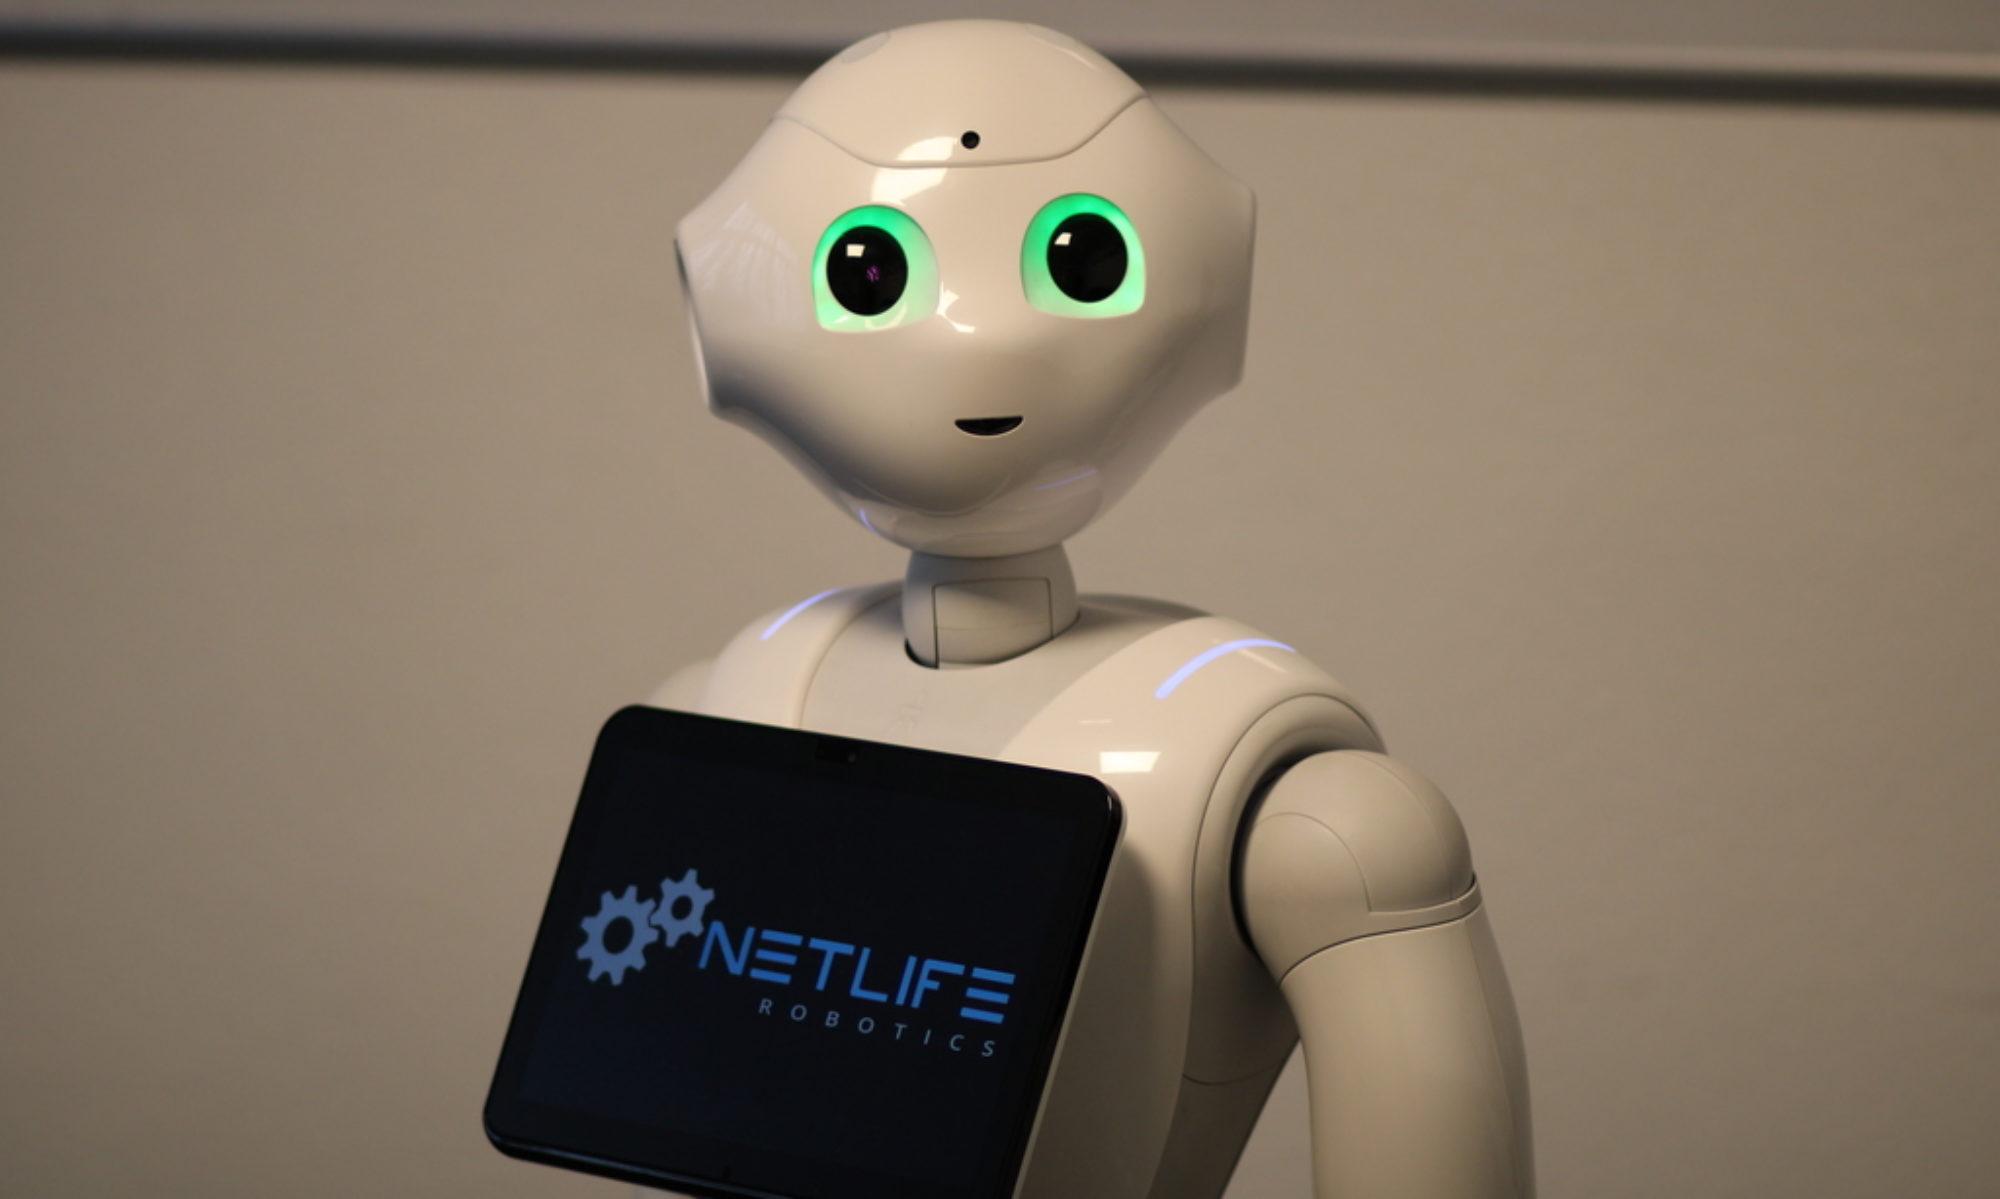 NETLIFE ROBOTICS